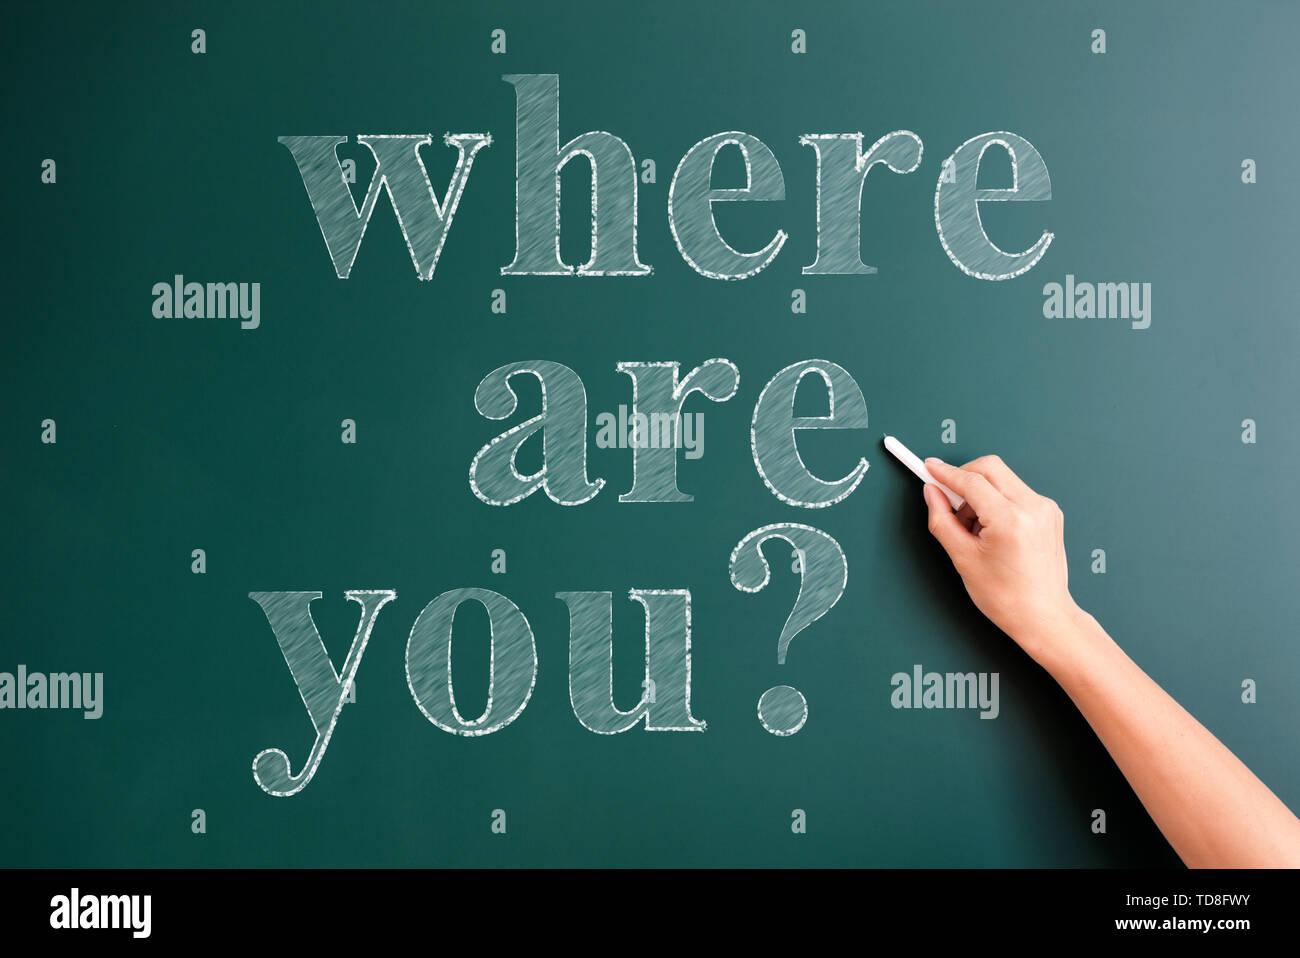 where are you written on blackboard - Stock Image